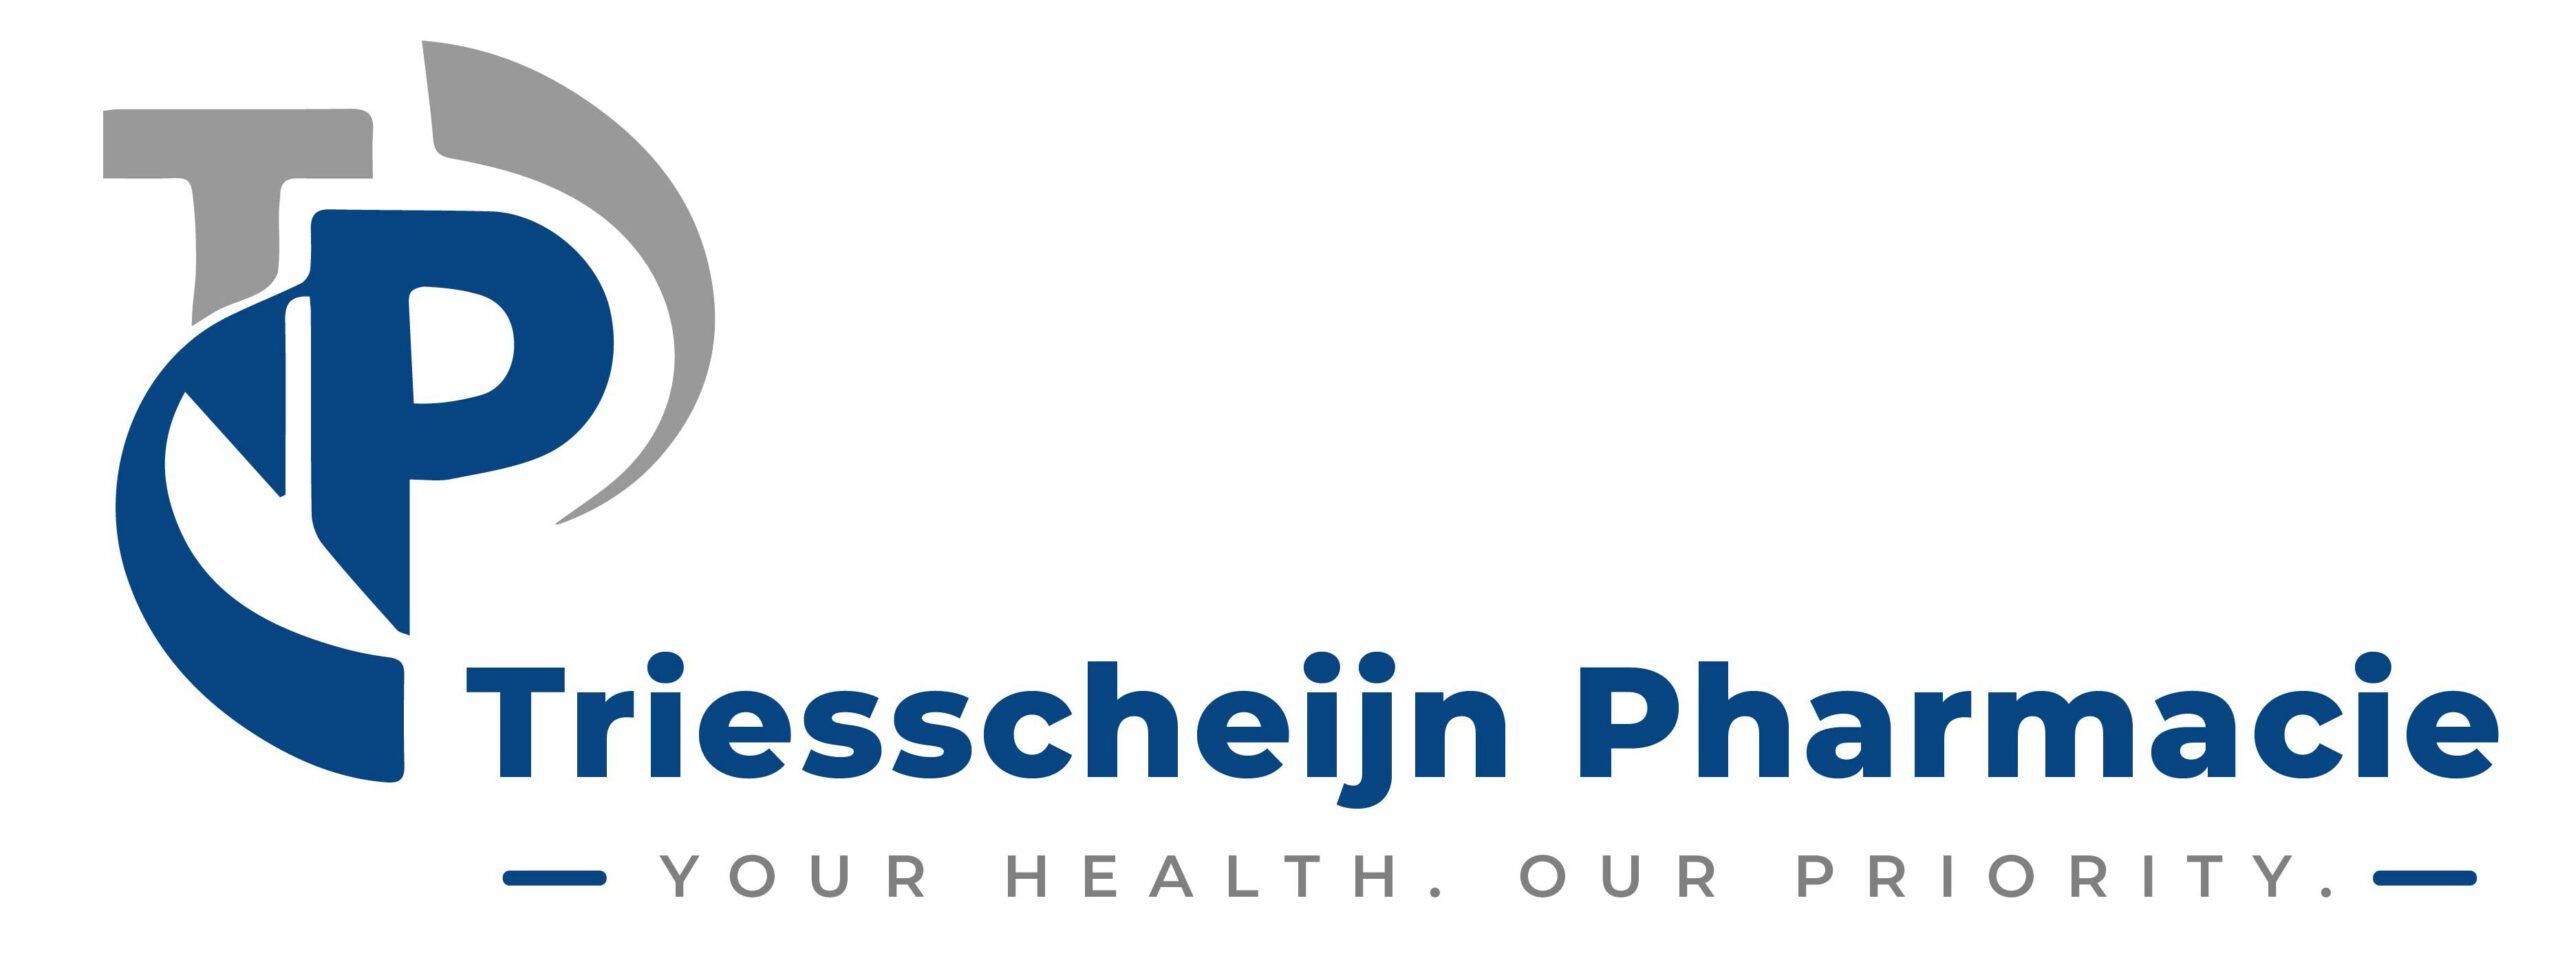 Triesscheijn Pharmacie